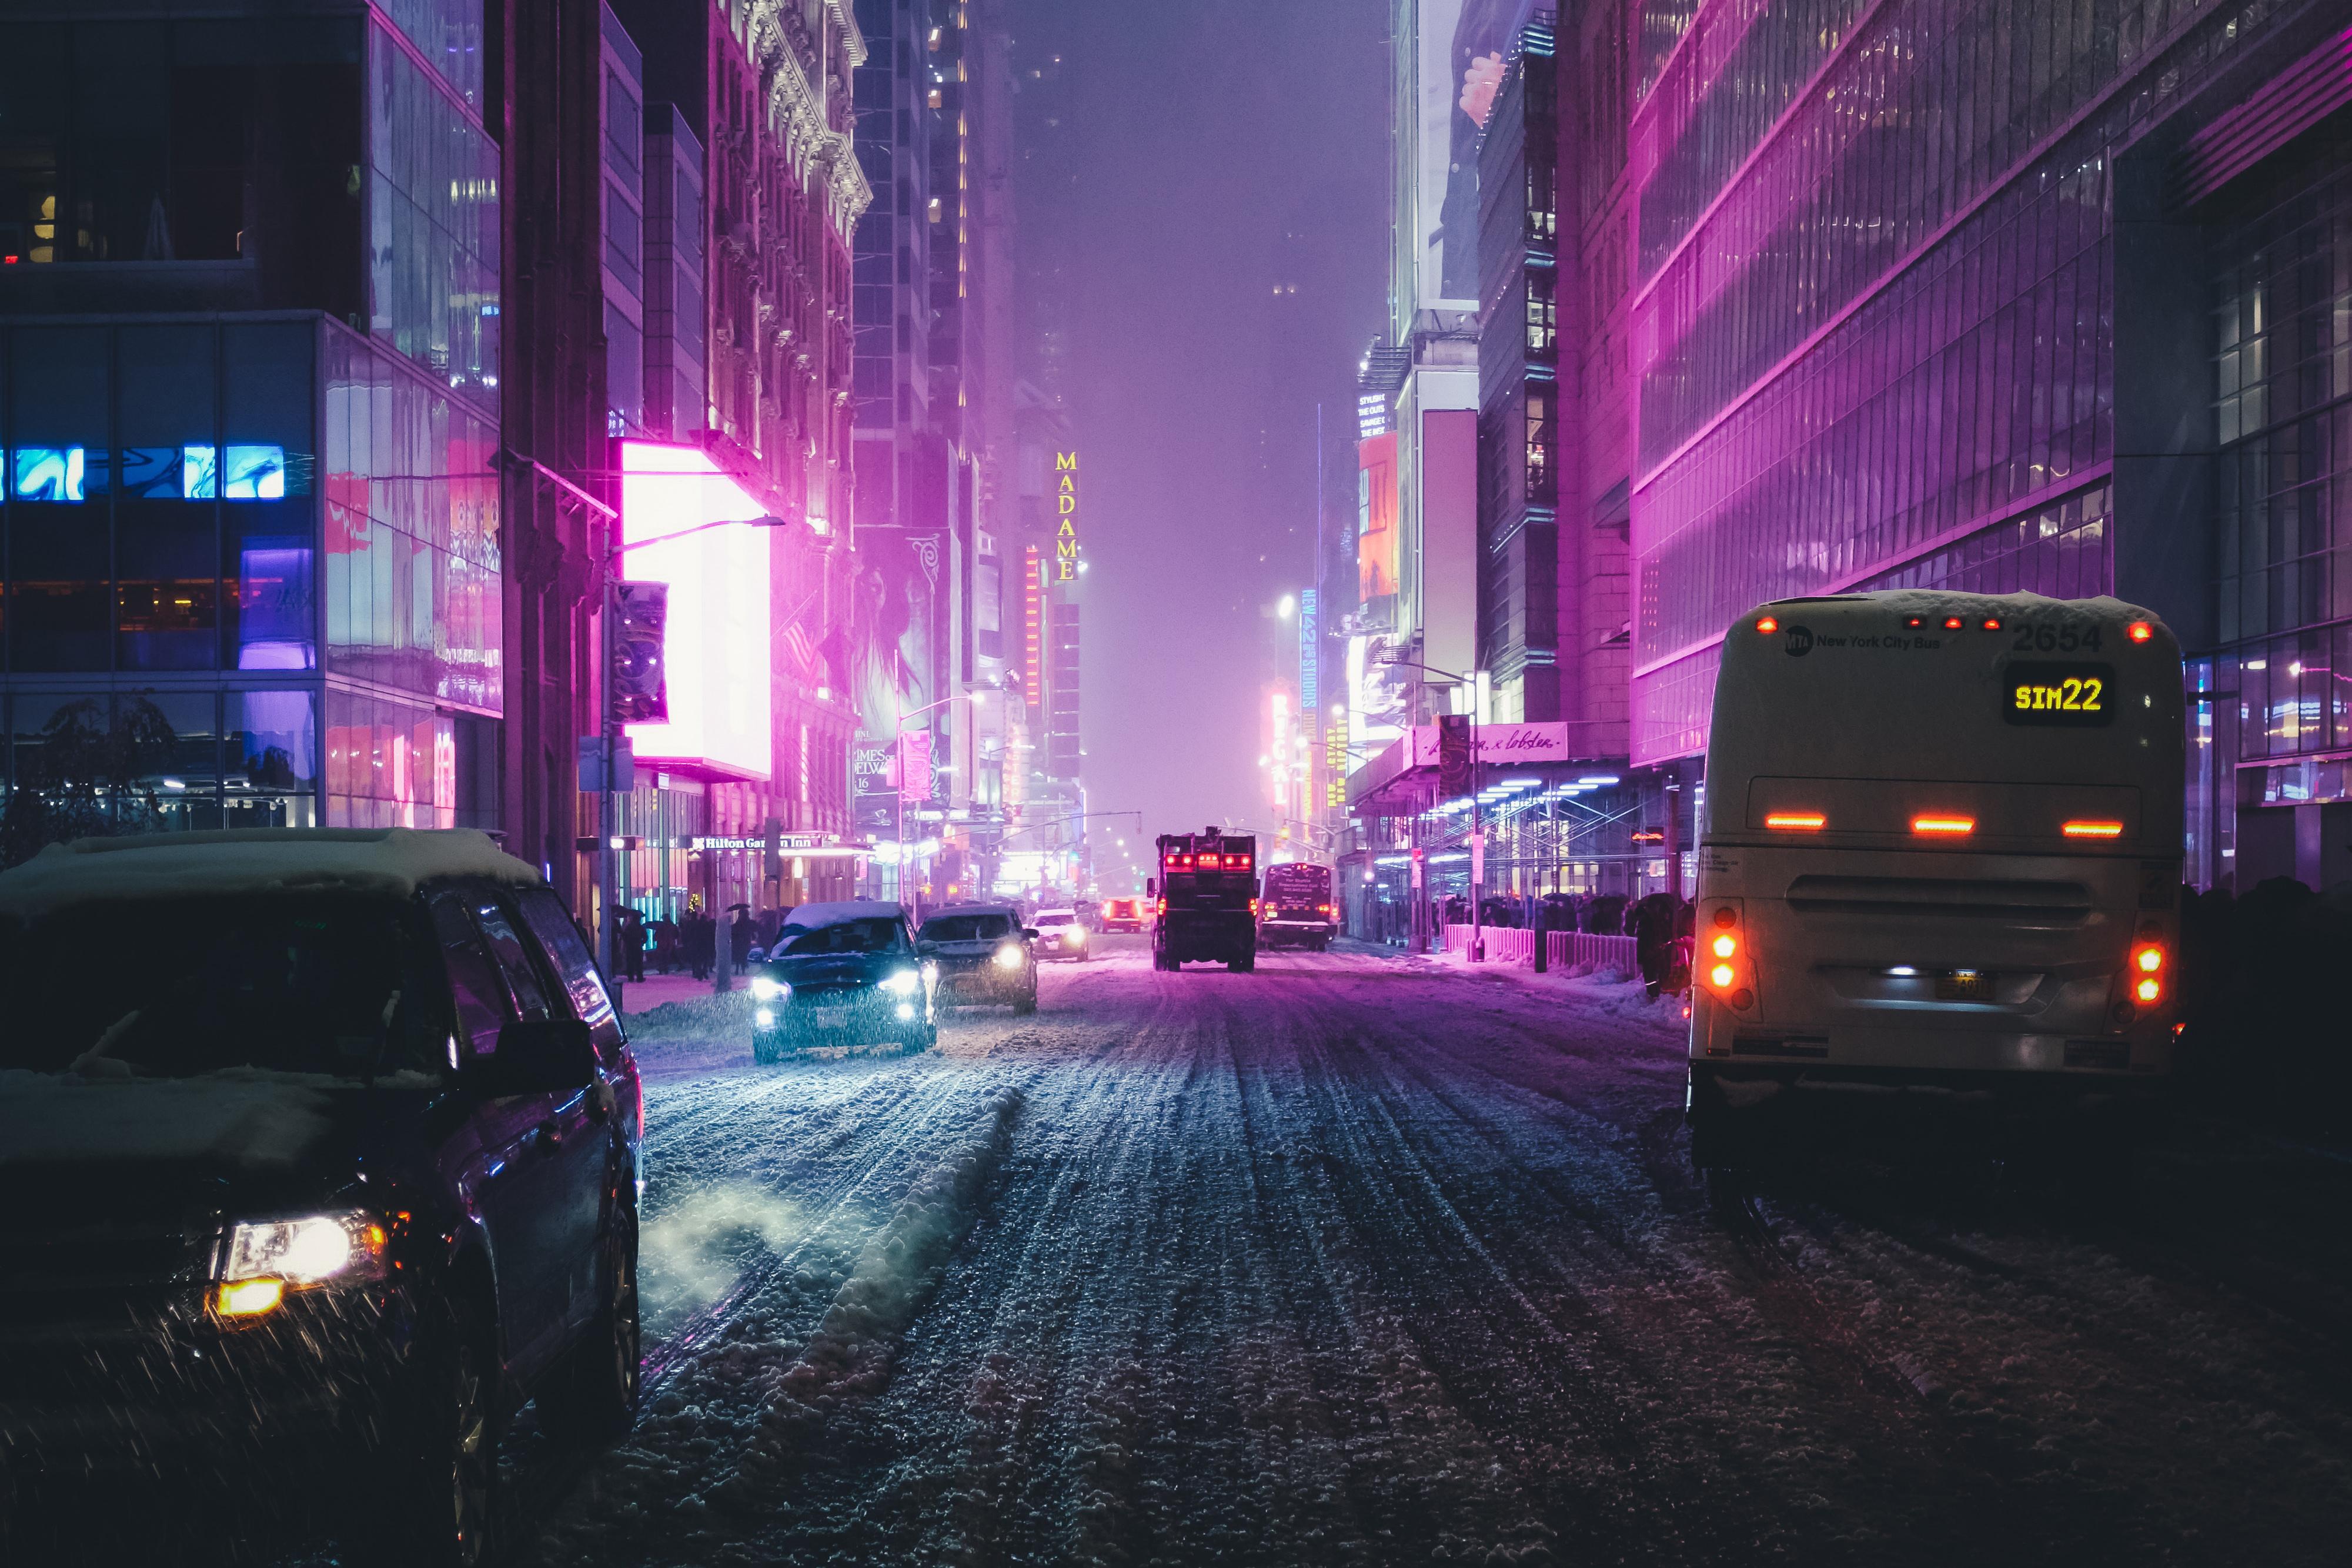 1366x768 Night City Street Neon Lights 4k 1366x768 Resolution HD